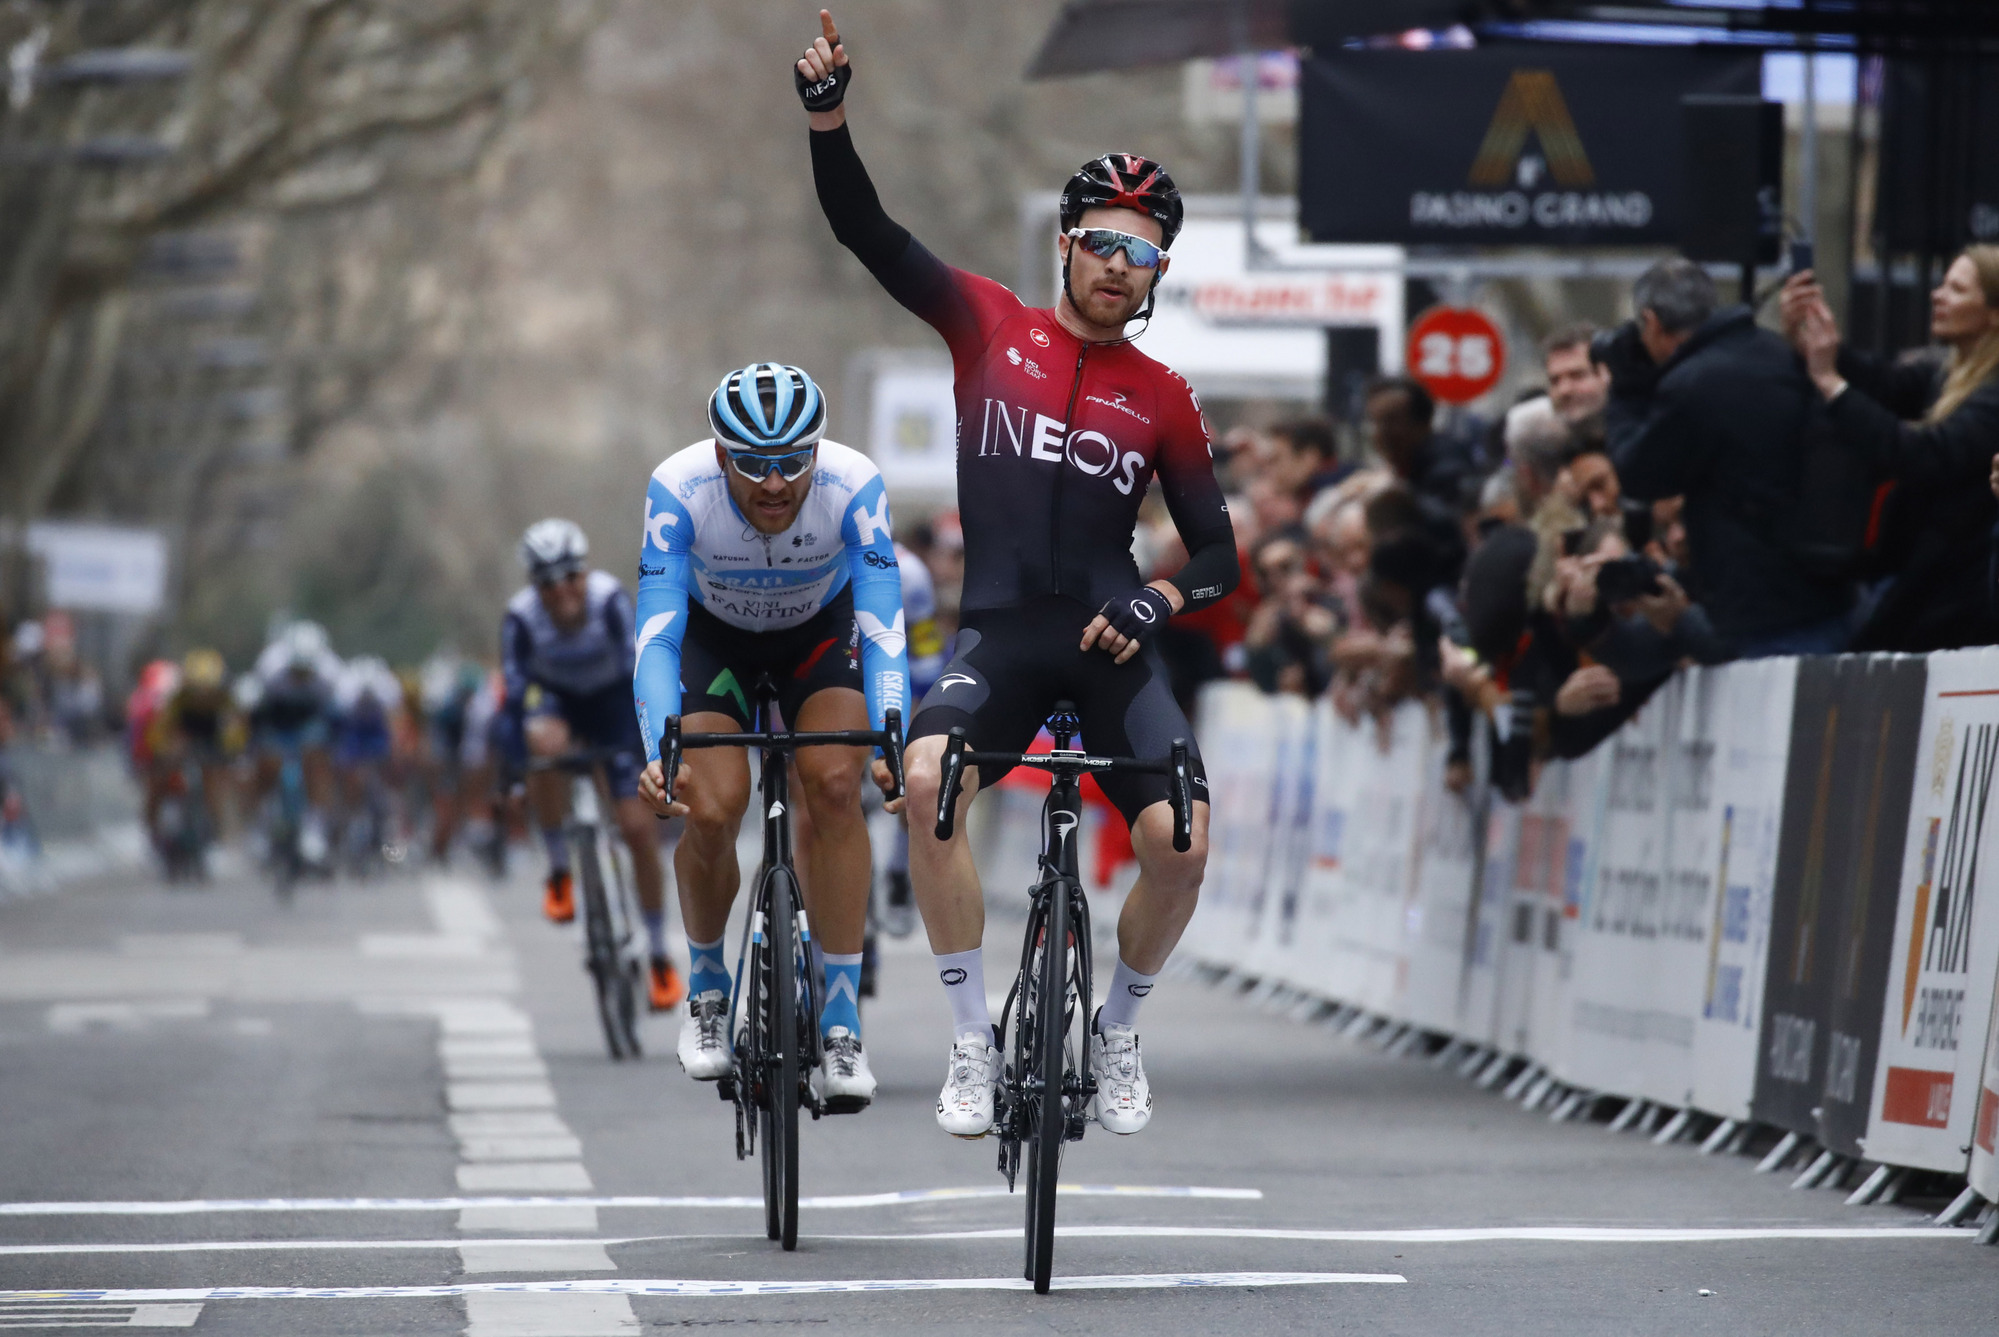 Tour de la Provence 2020 - 5th Edition - 4th stage Avignon - Aix-en-Provence 170,5 km - 16/02/2020 - Owain Doull (GBR - Team Ineos) - Matthias Brandle (AUT - Israel Start-Up Nation) - photo Luca Bettini/BettiniPhoto©2020